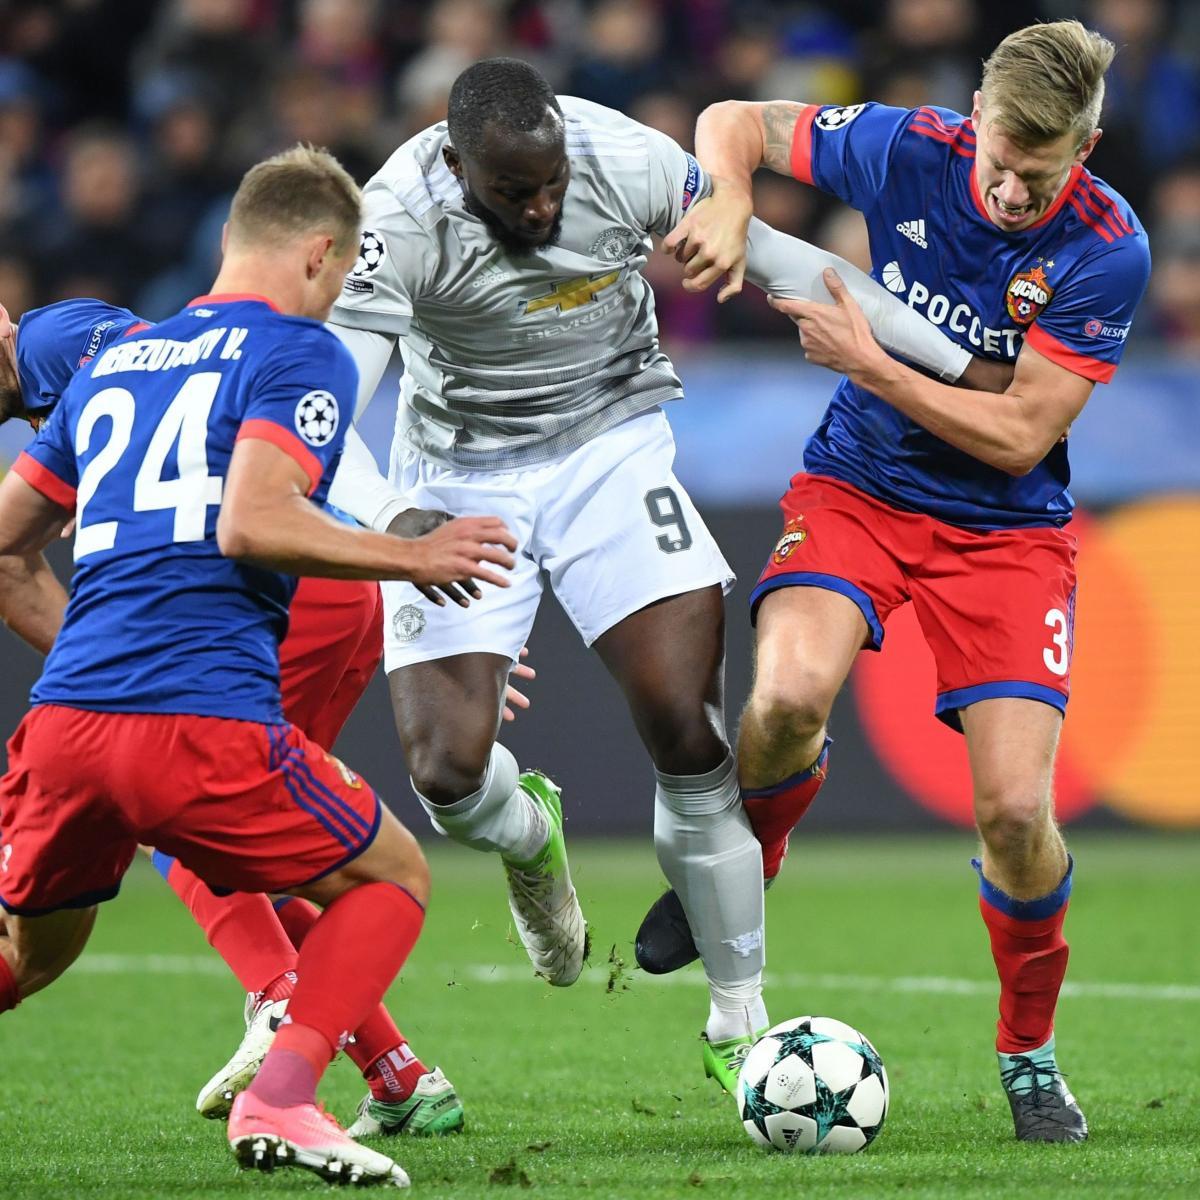 Bastia 0 3 Psg Match Report: Champions League 2017: Live Stream, TV Info, Schedule For